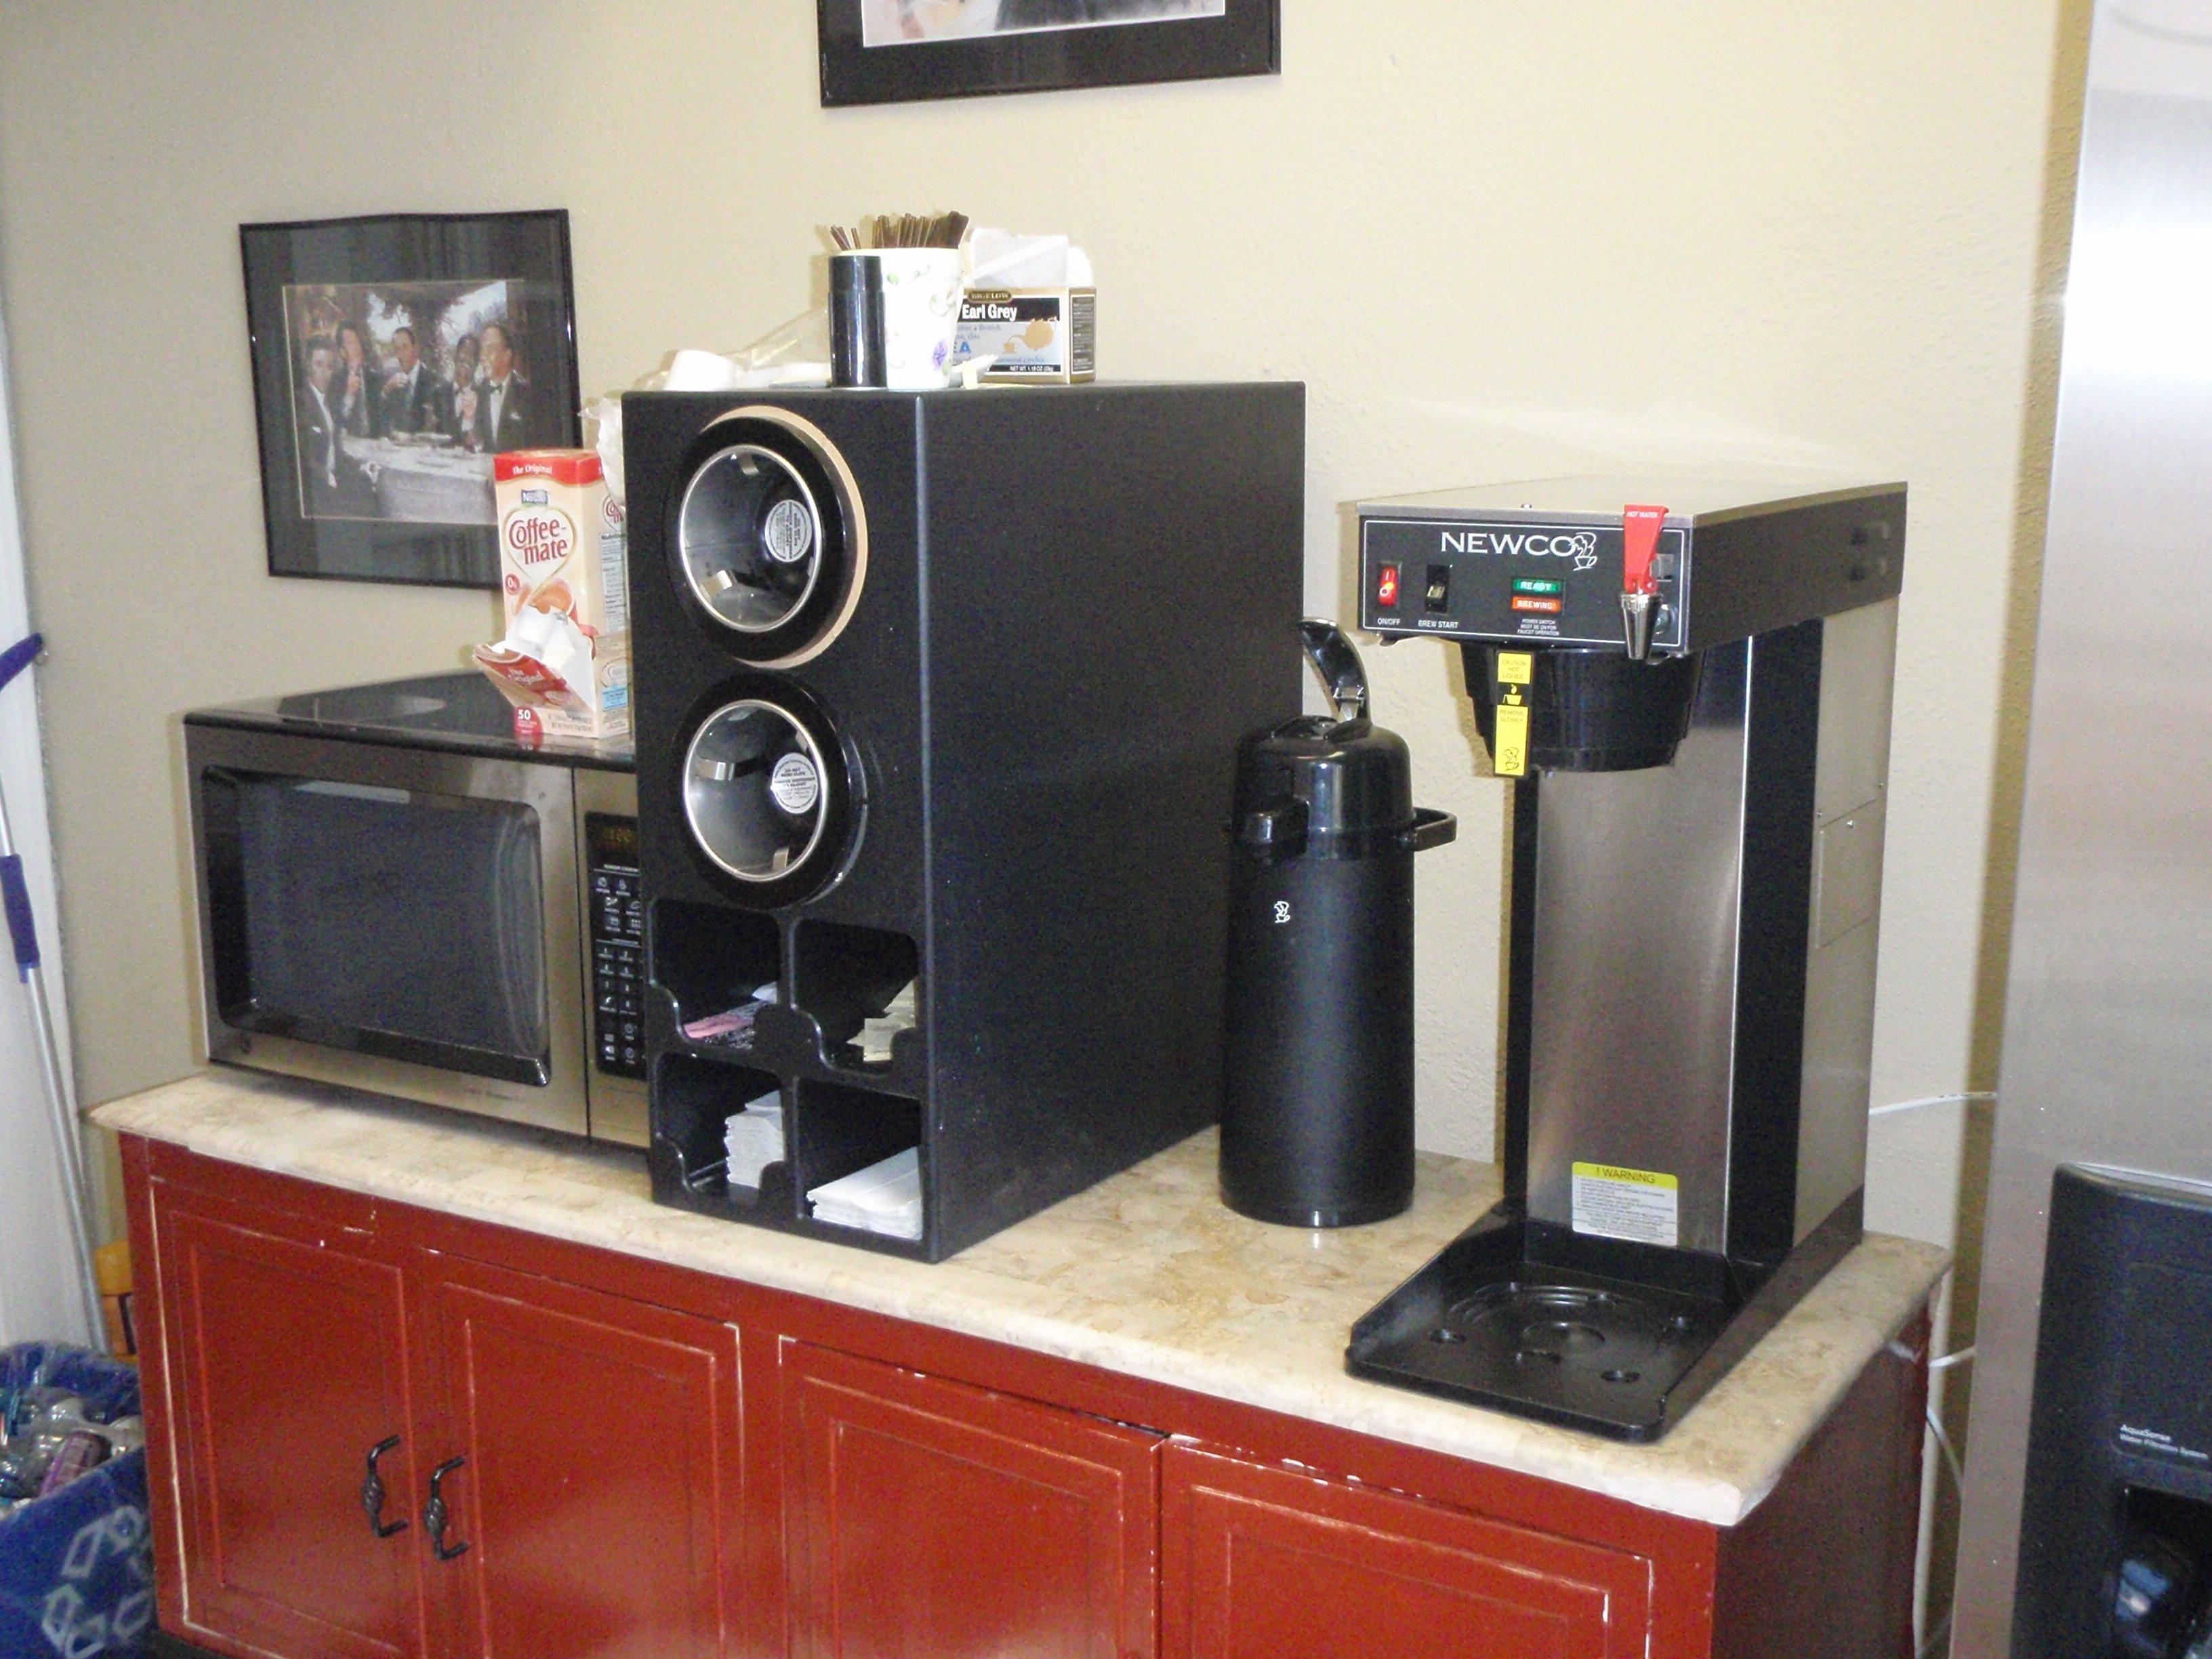 Office Coffee Service & Amenities, Greensboro NC